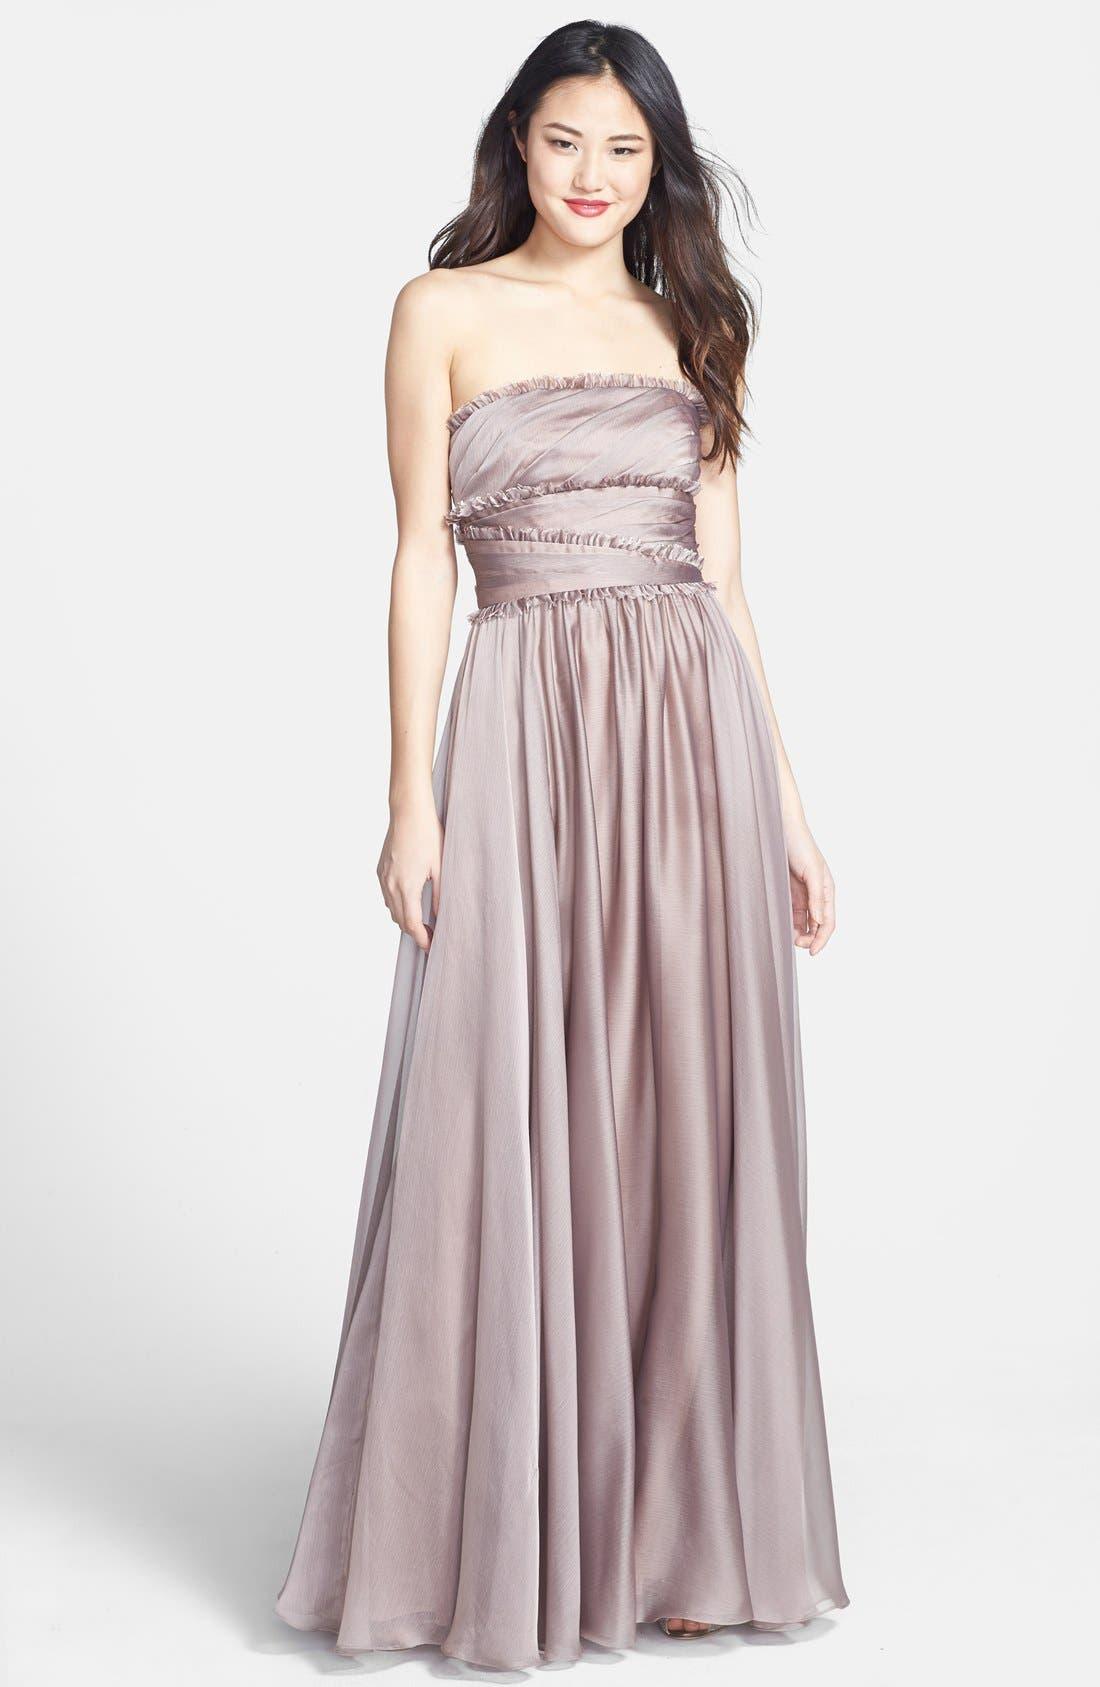 Main Image - ML Monique Lhuillier Bridesmaids Strapless Chiffon Gown (Nordstrom Exclusive)